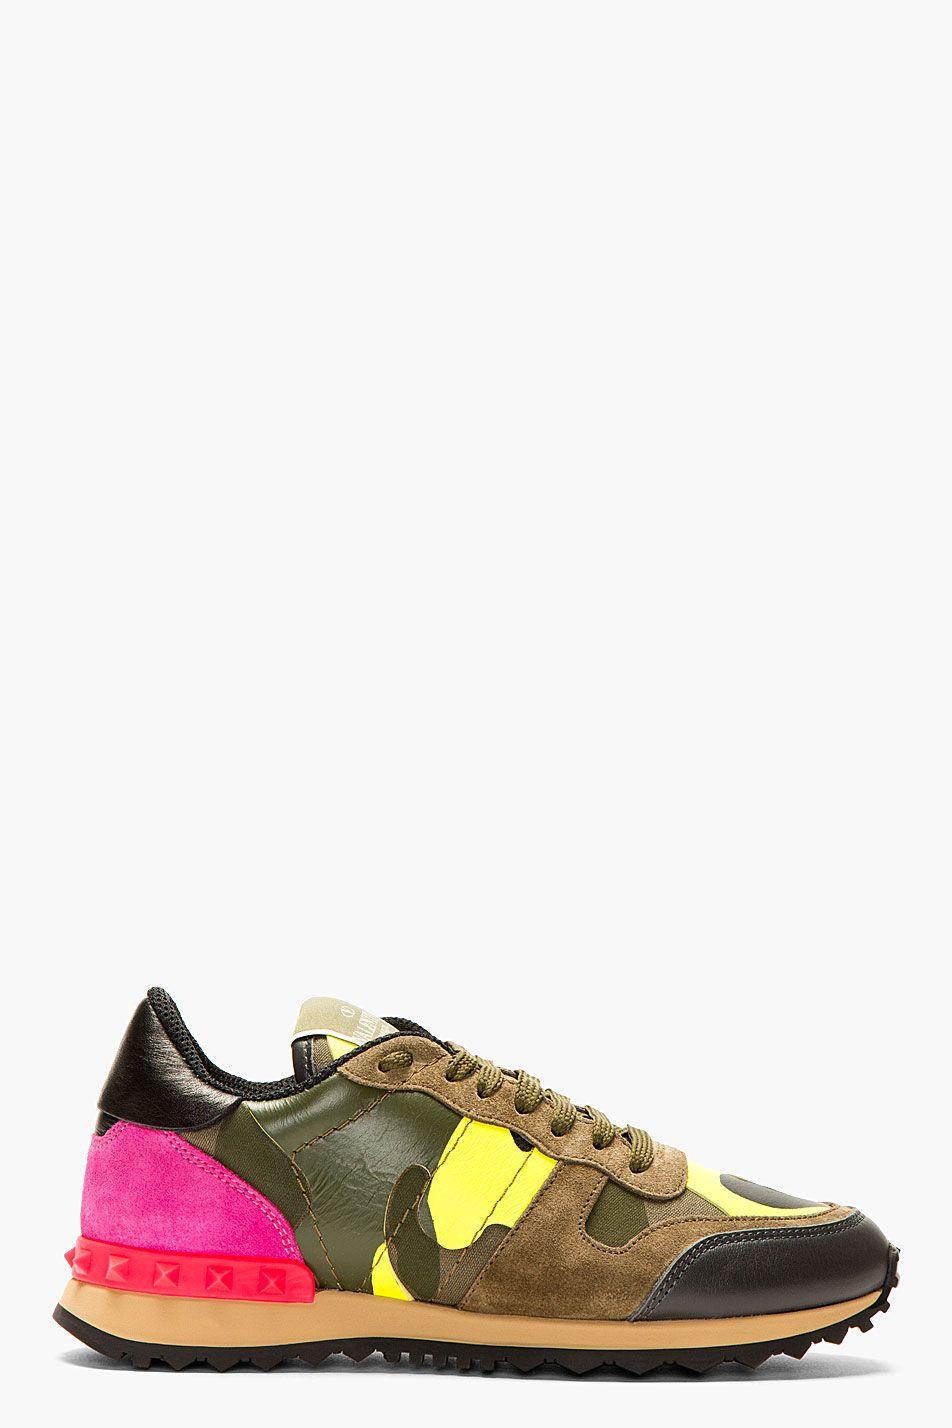 82a2614e0 VALENTINO Fluorescent Pink & Yellow Camo Print Sneakers   can i kick ...